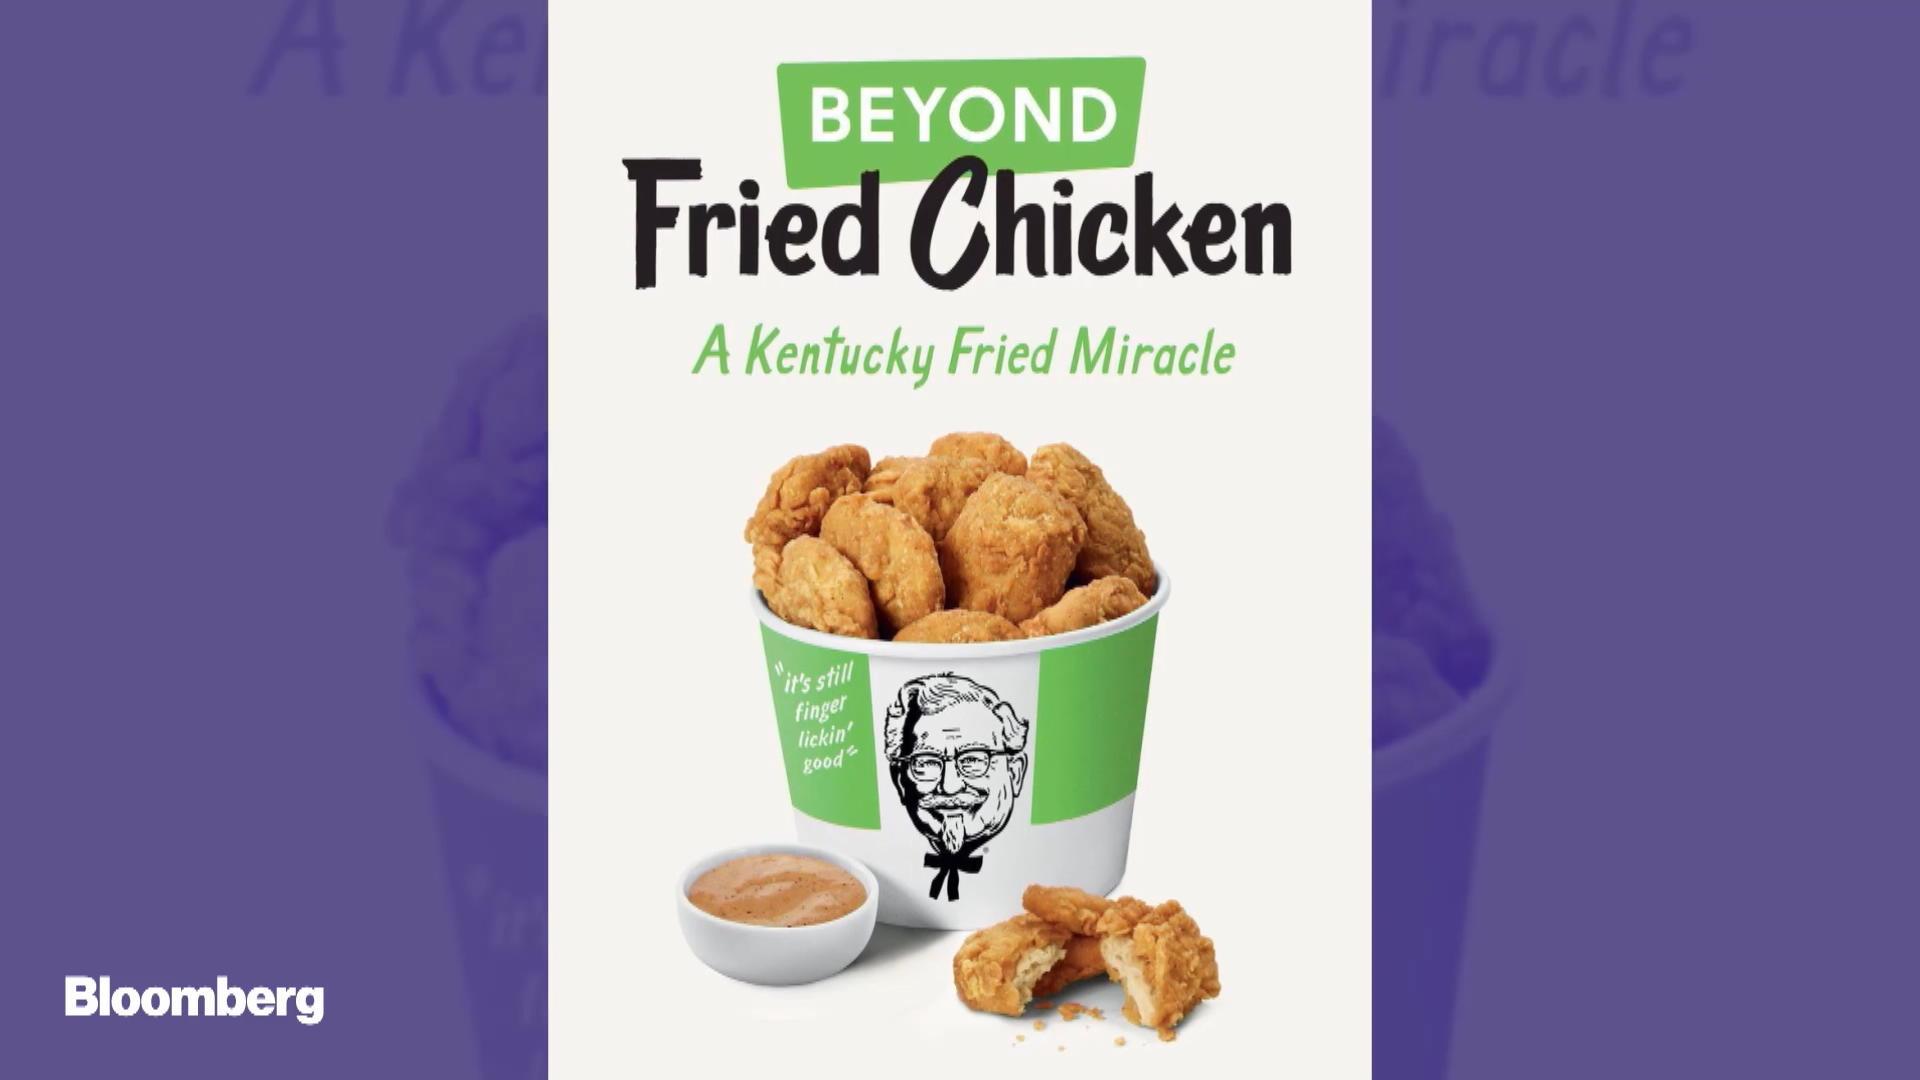 Beyond Meat (BYND) Fried Chicken Taste Test at KFC (YUM